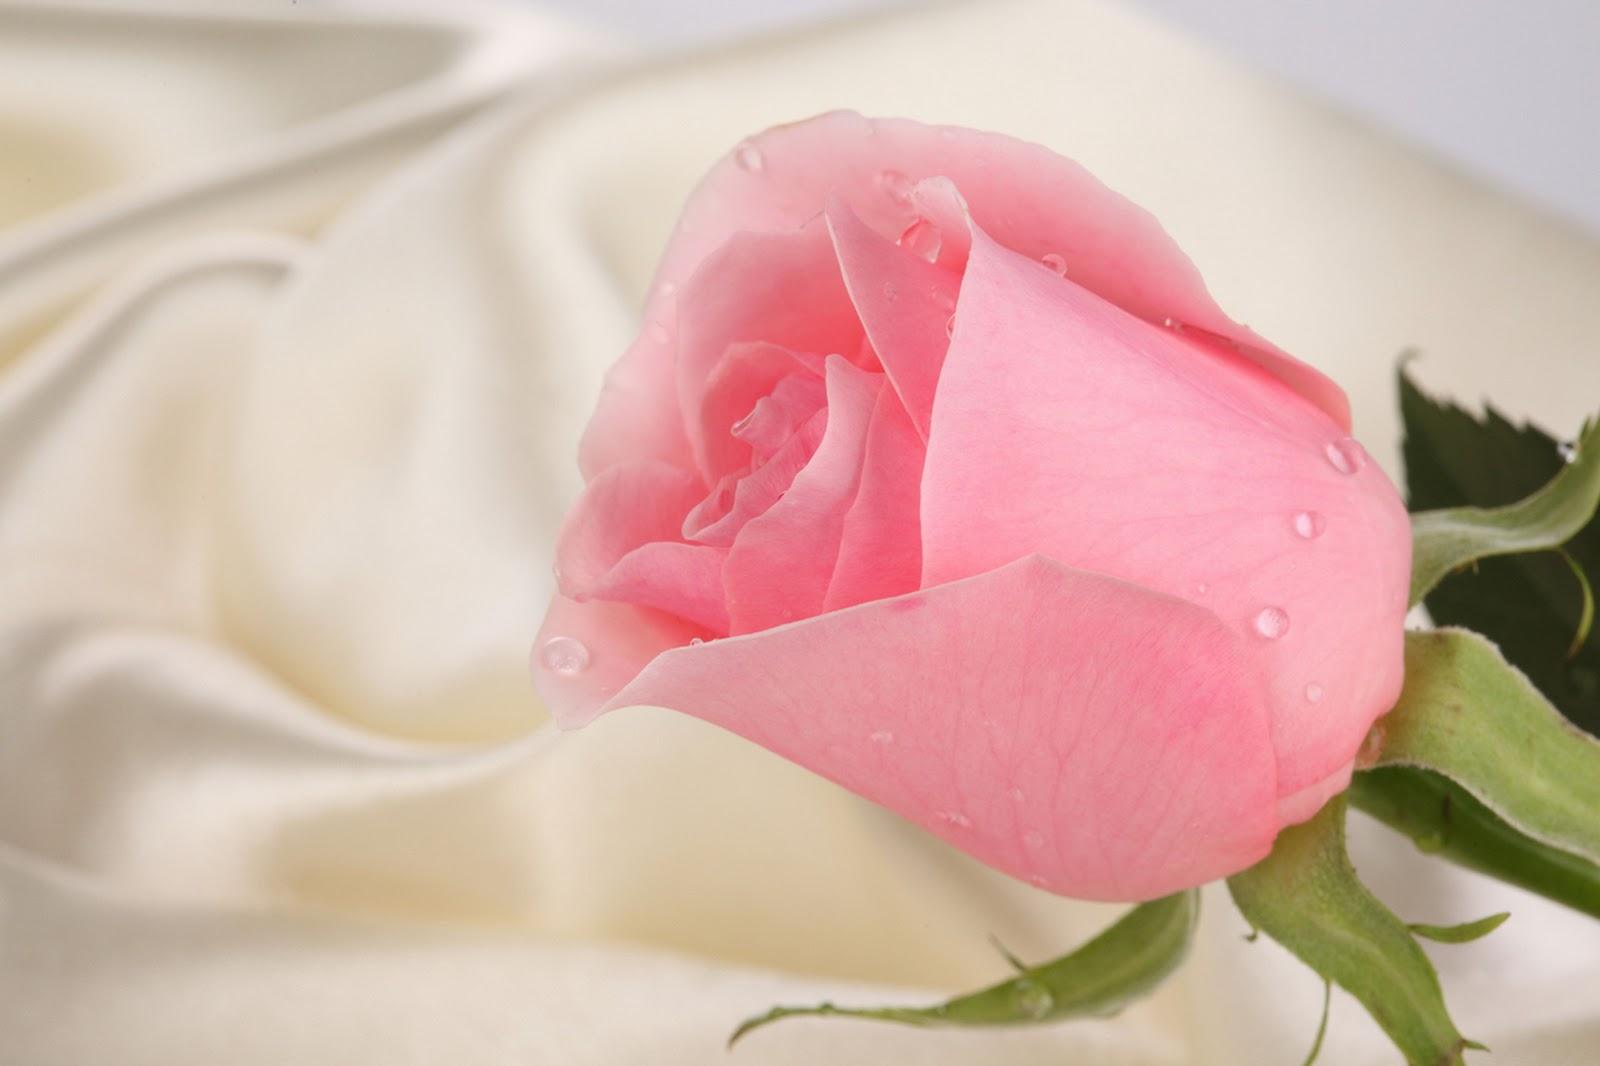 Kumpulan Gambar Wallpaper Bunga Mawar Merah Bilik Wallpaper